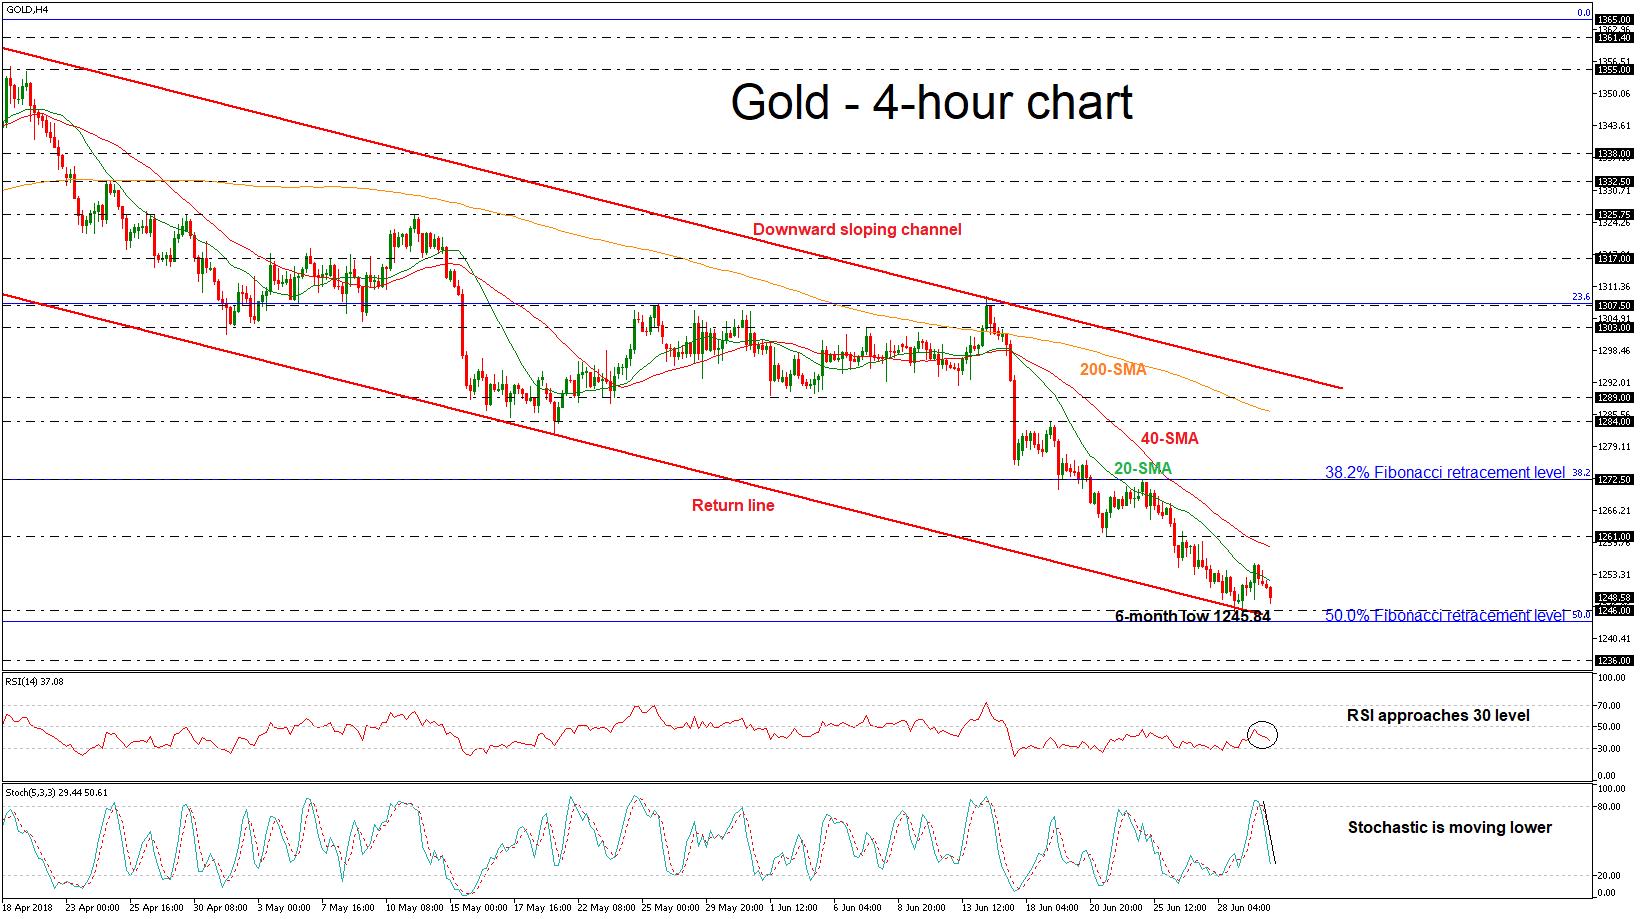 Technical Analysis – Gold holds near return line of downward